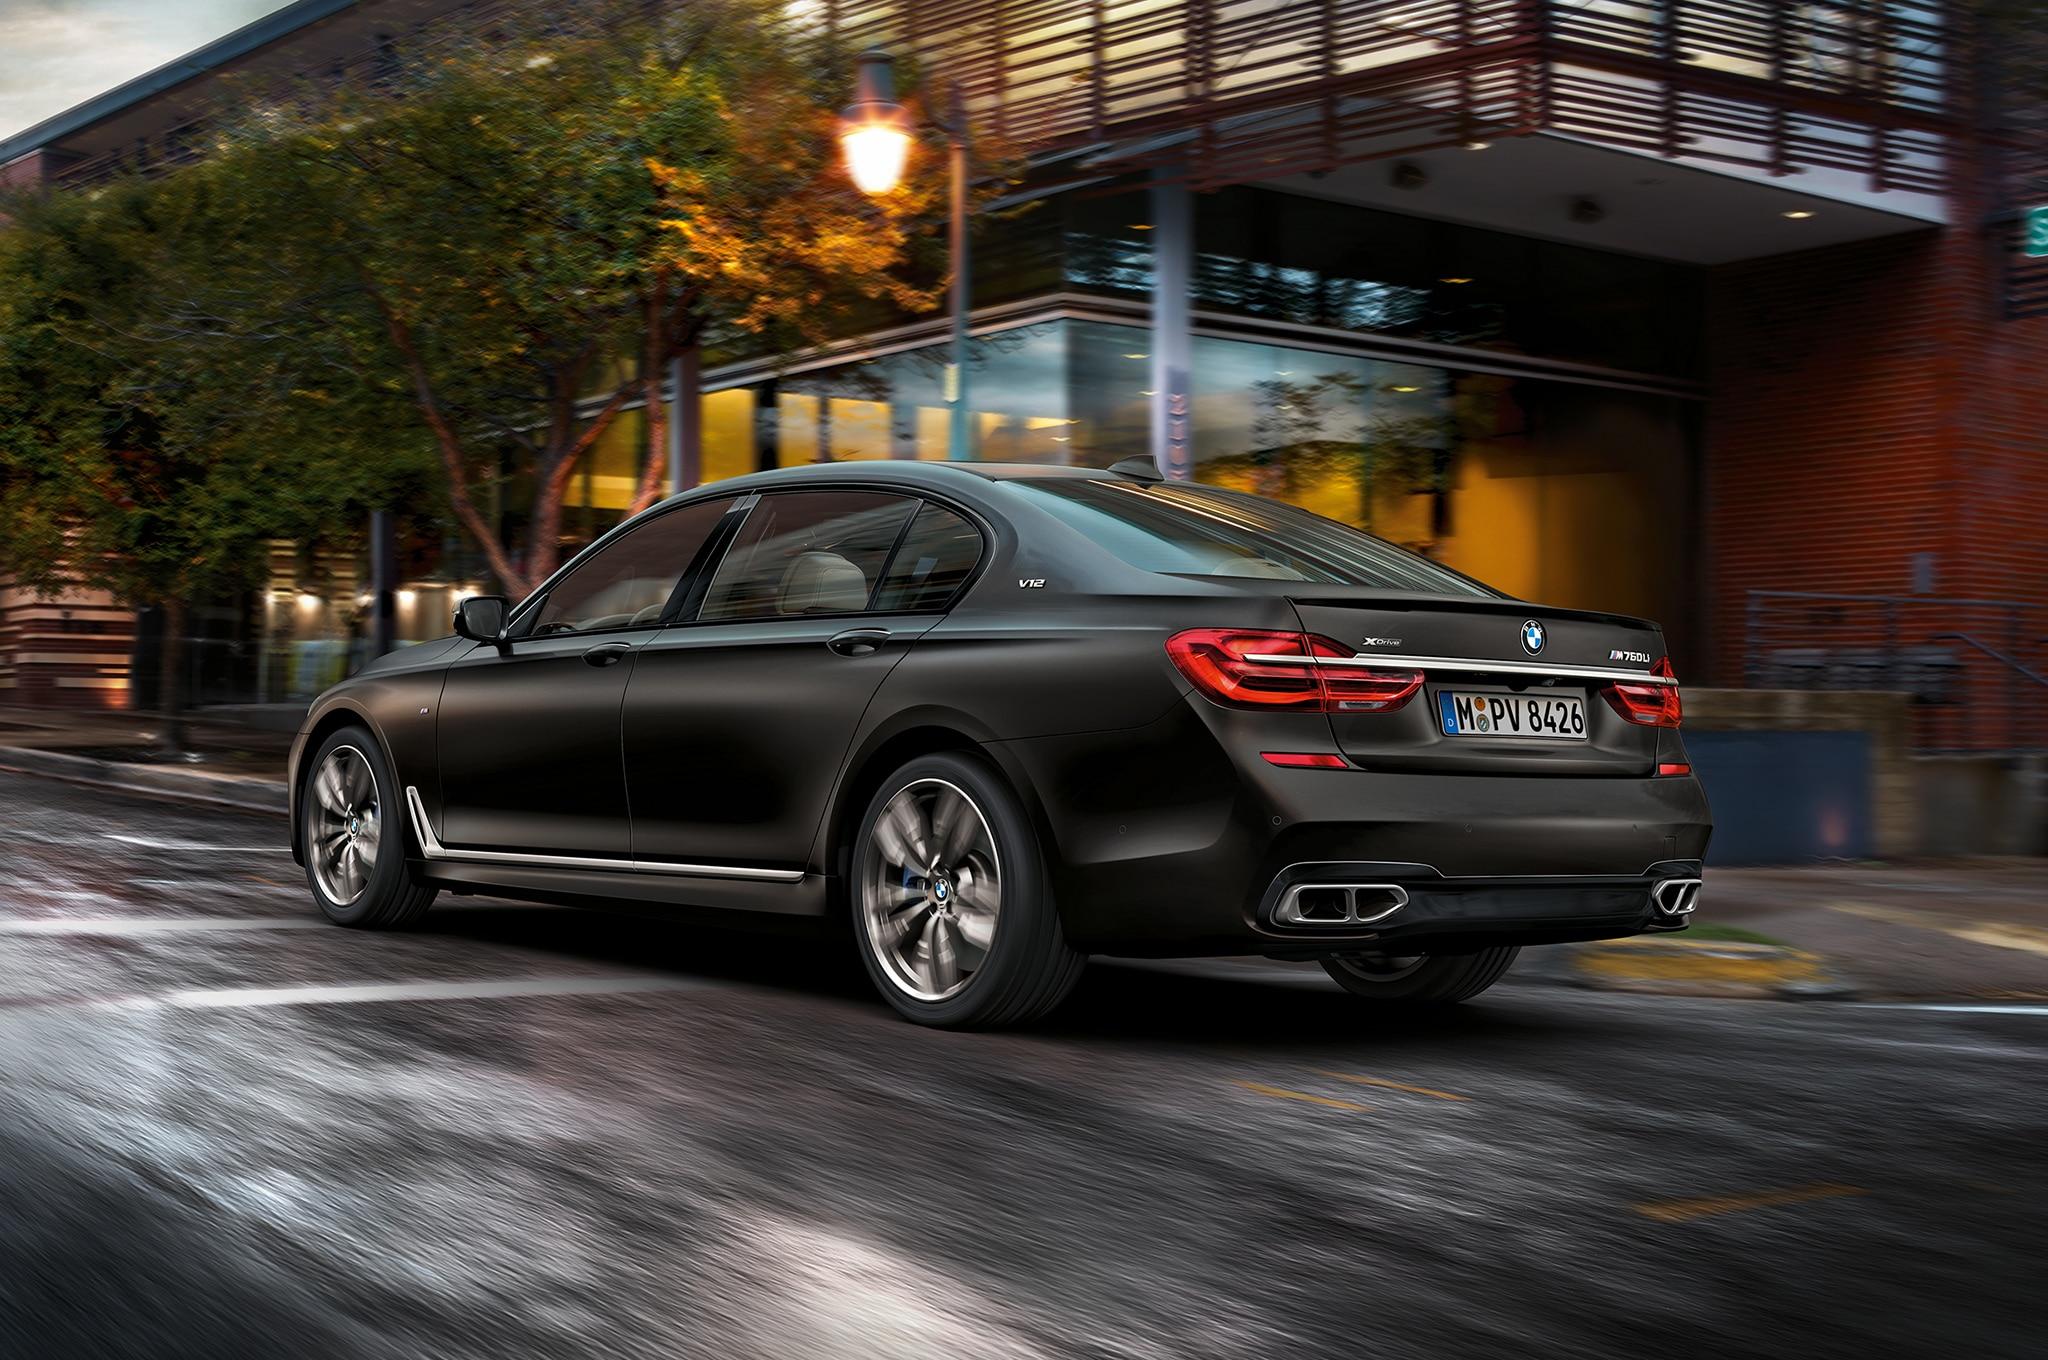 2017 BMW M760i xDrive is a 12Cylinder HighPerformance Luxury Sedan